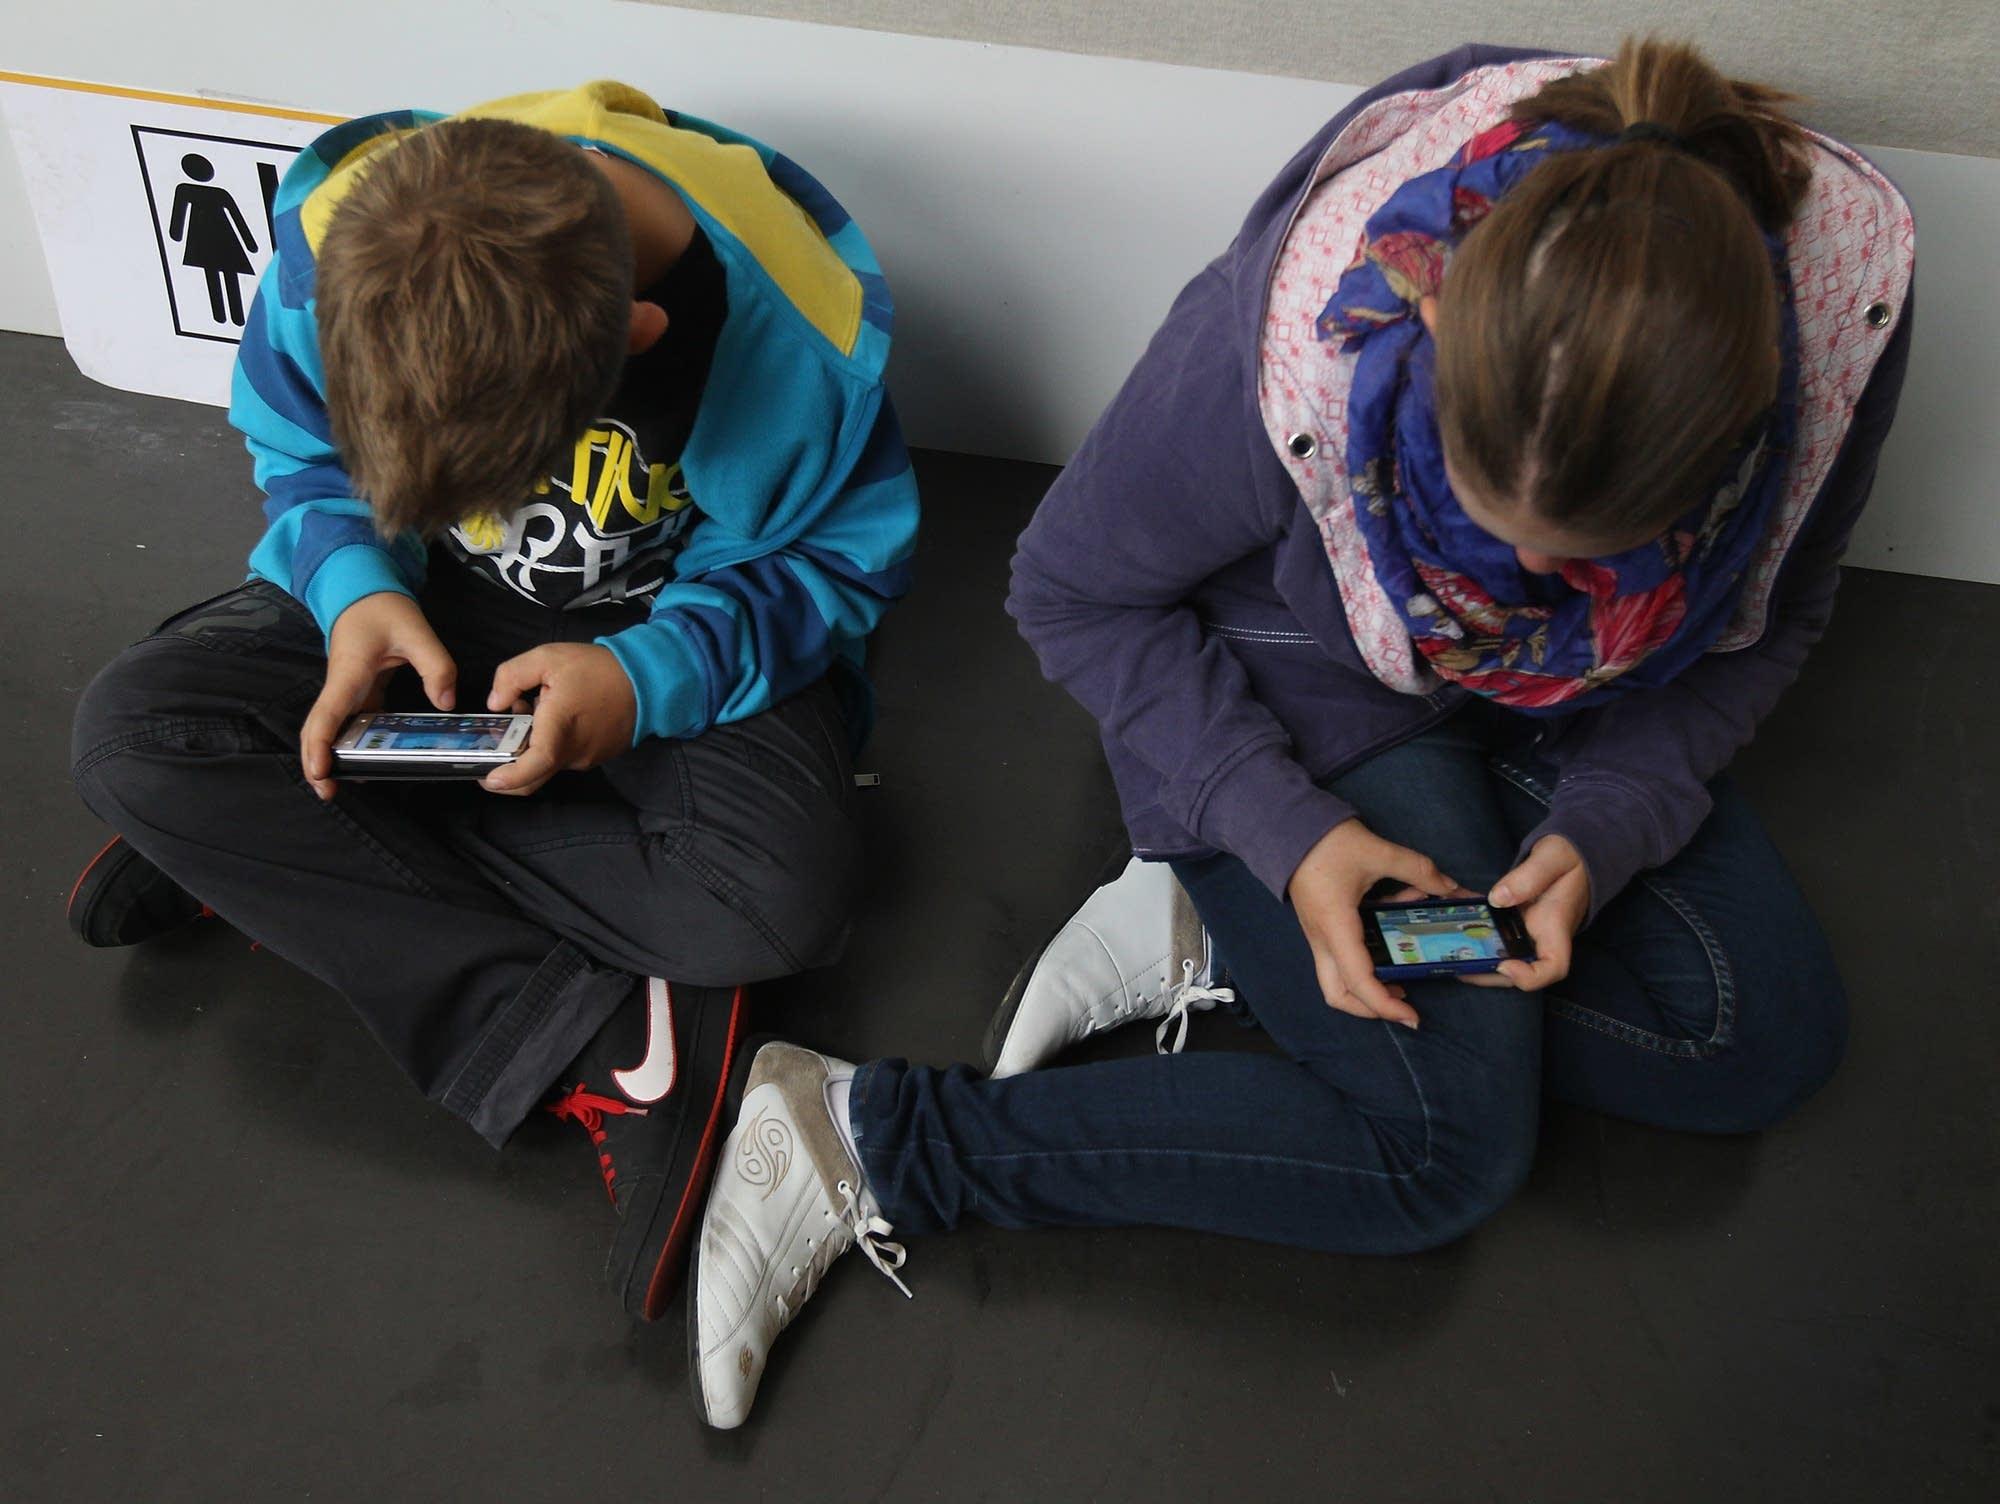 A psych professor asks: Have smartphones destroyed a generation?